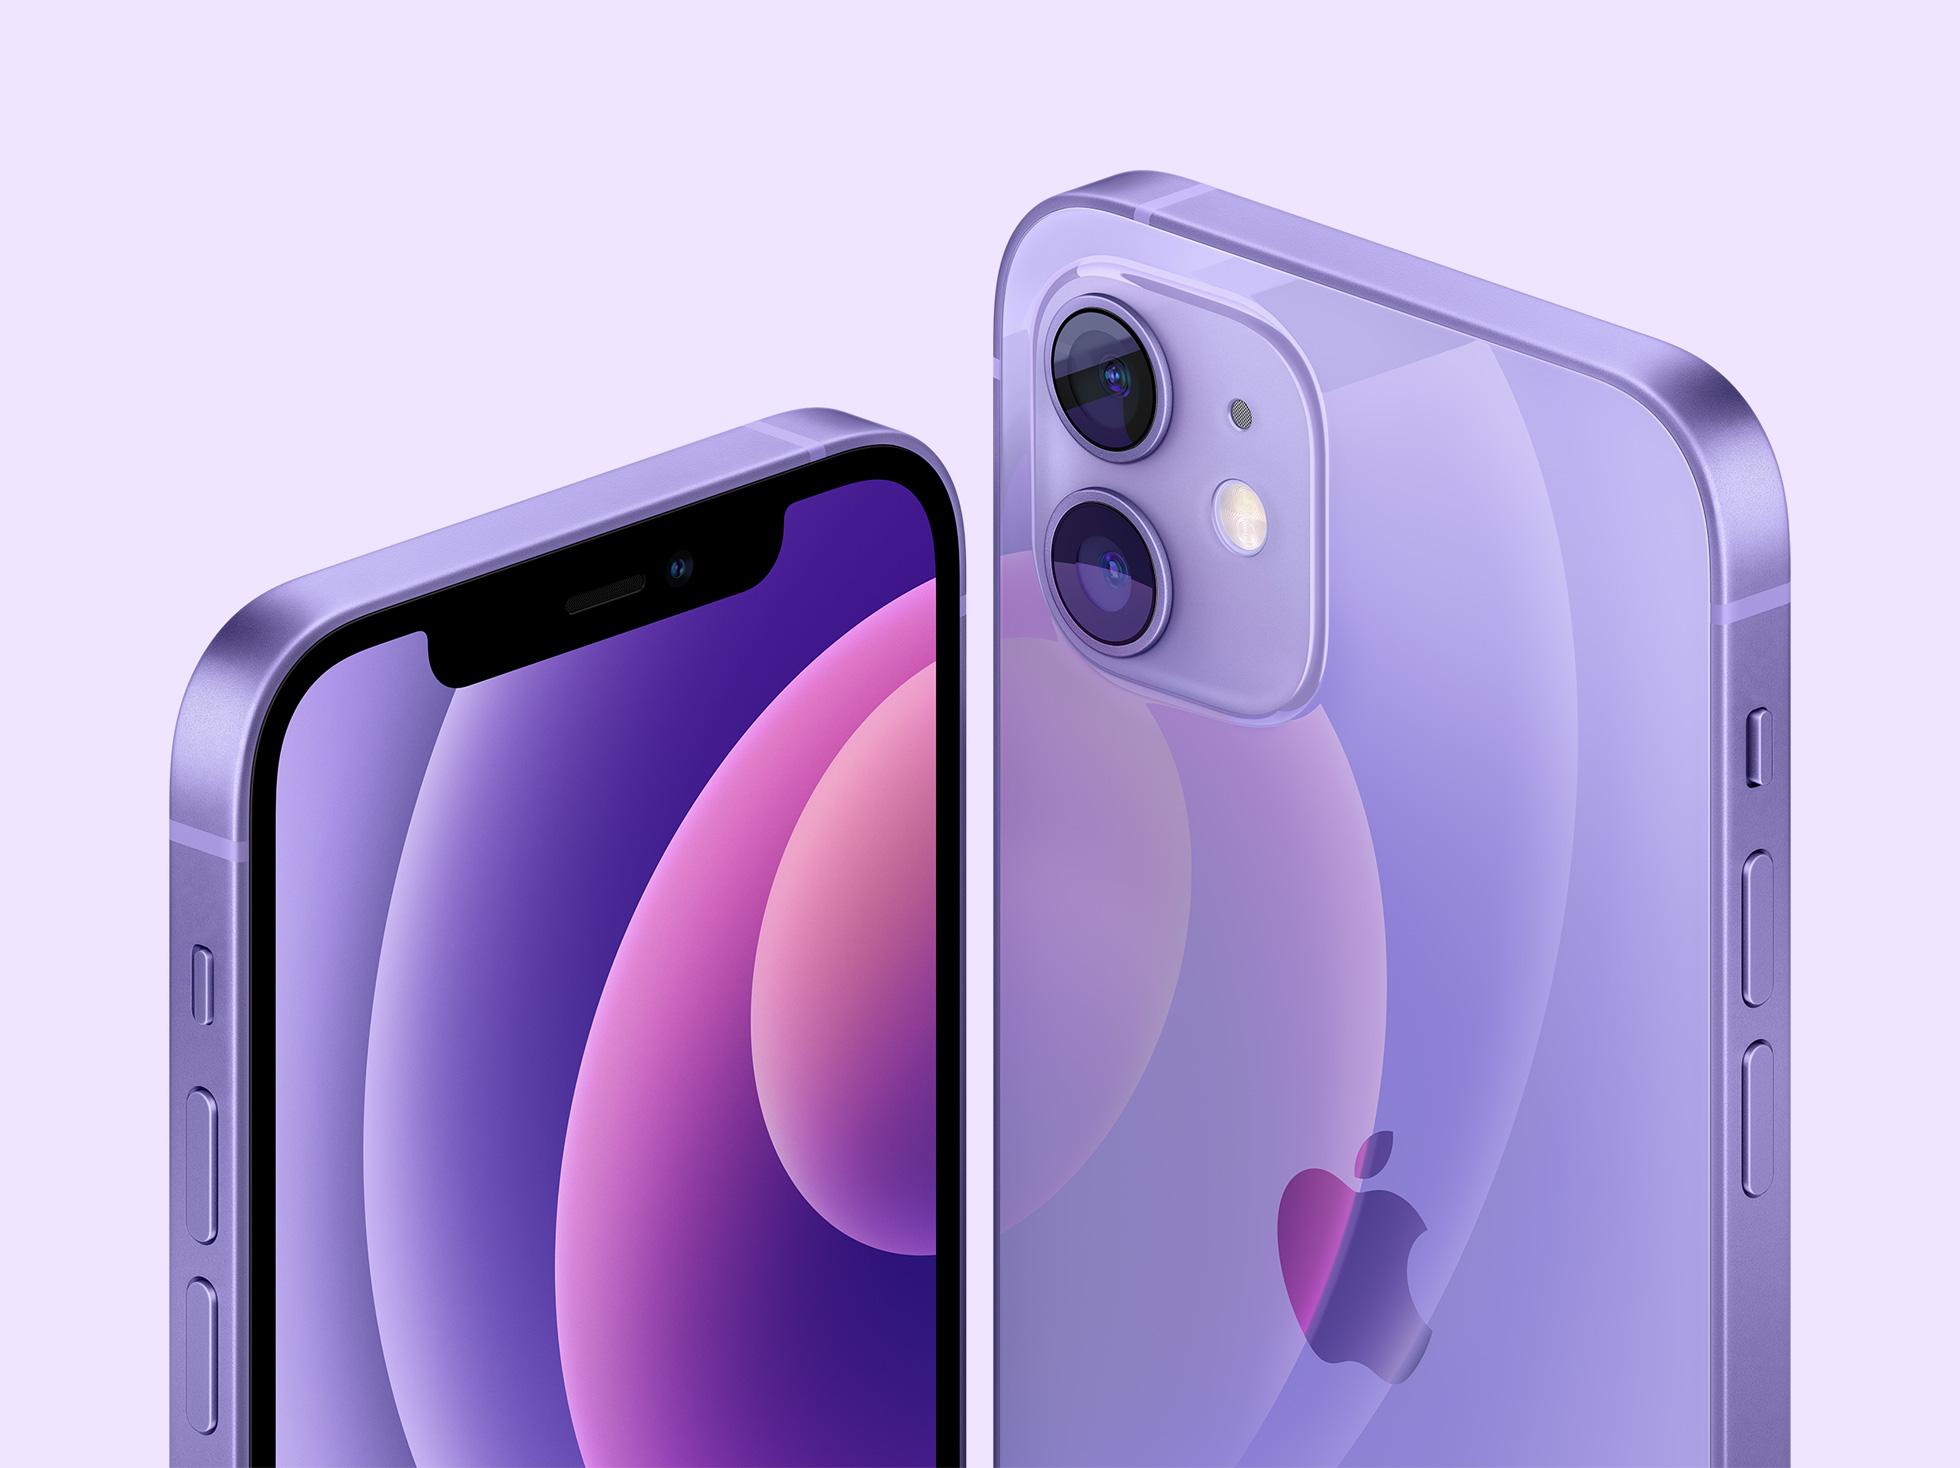 Uploads%2farticles%2f14947%2fapple iphone 12 spring21 purple 04202021 big.jpg.large 2x